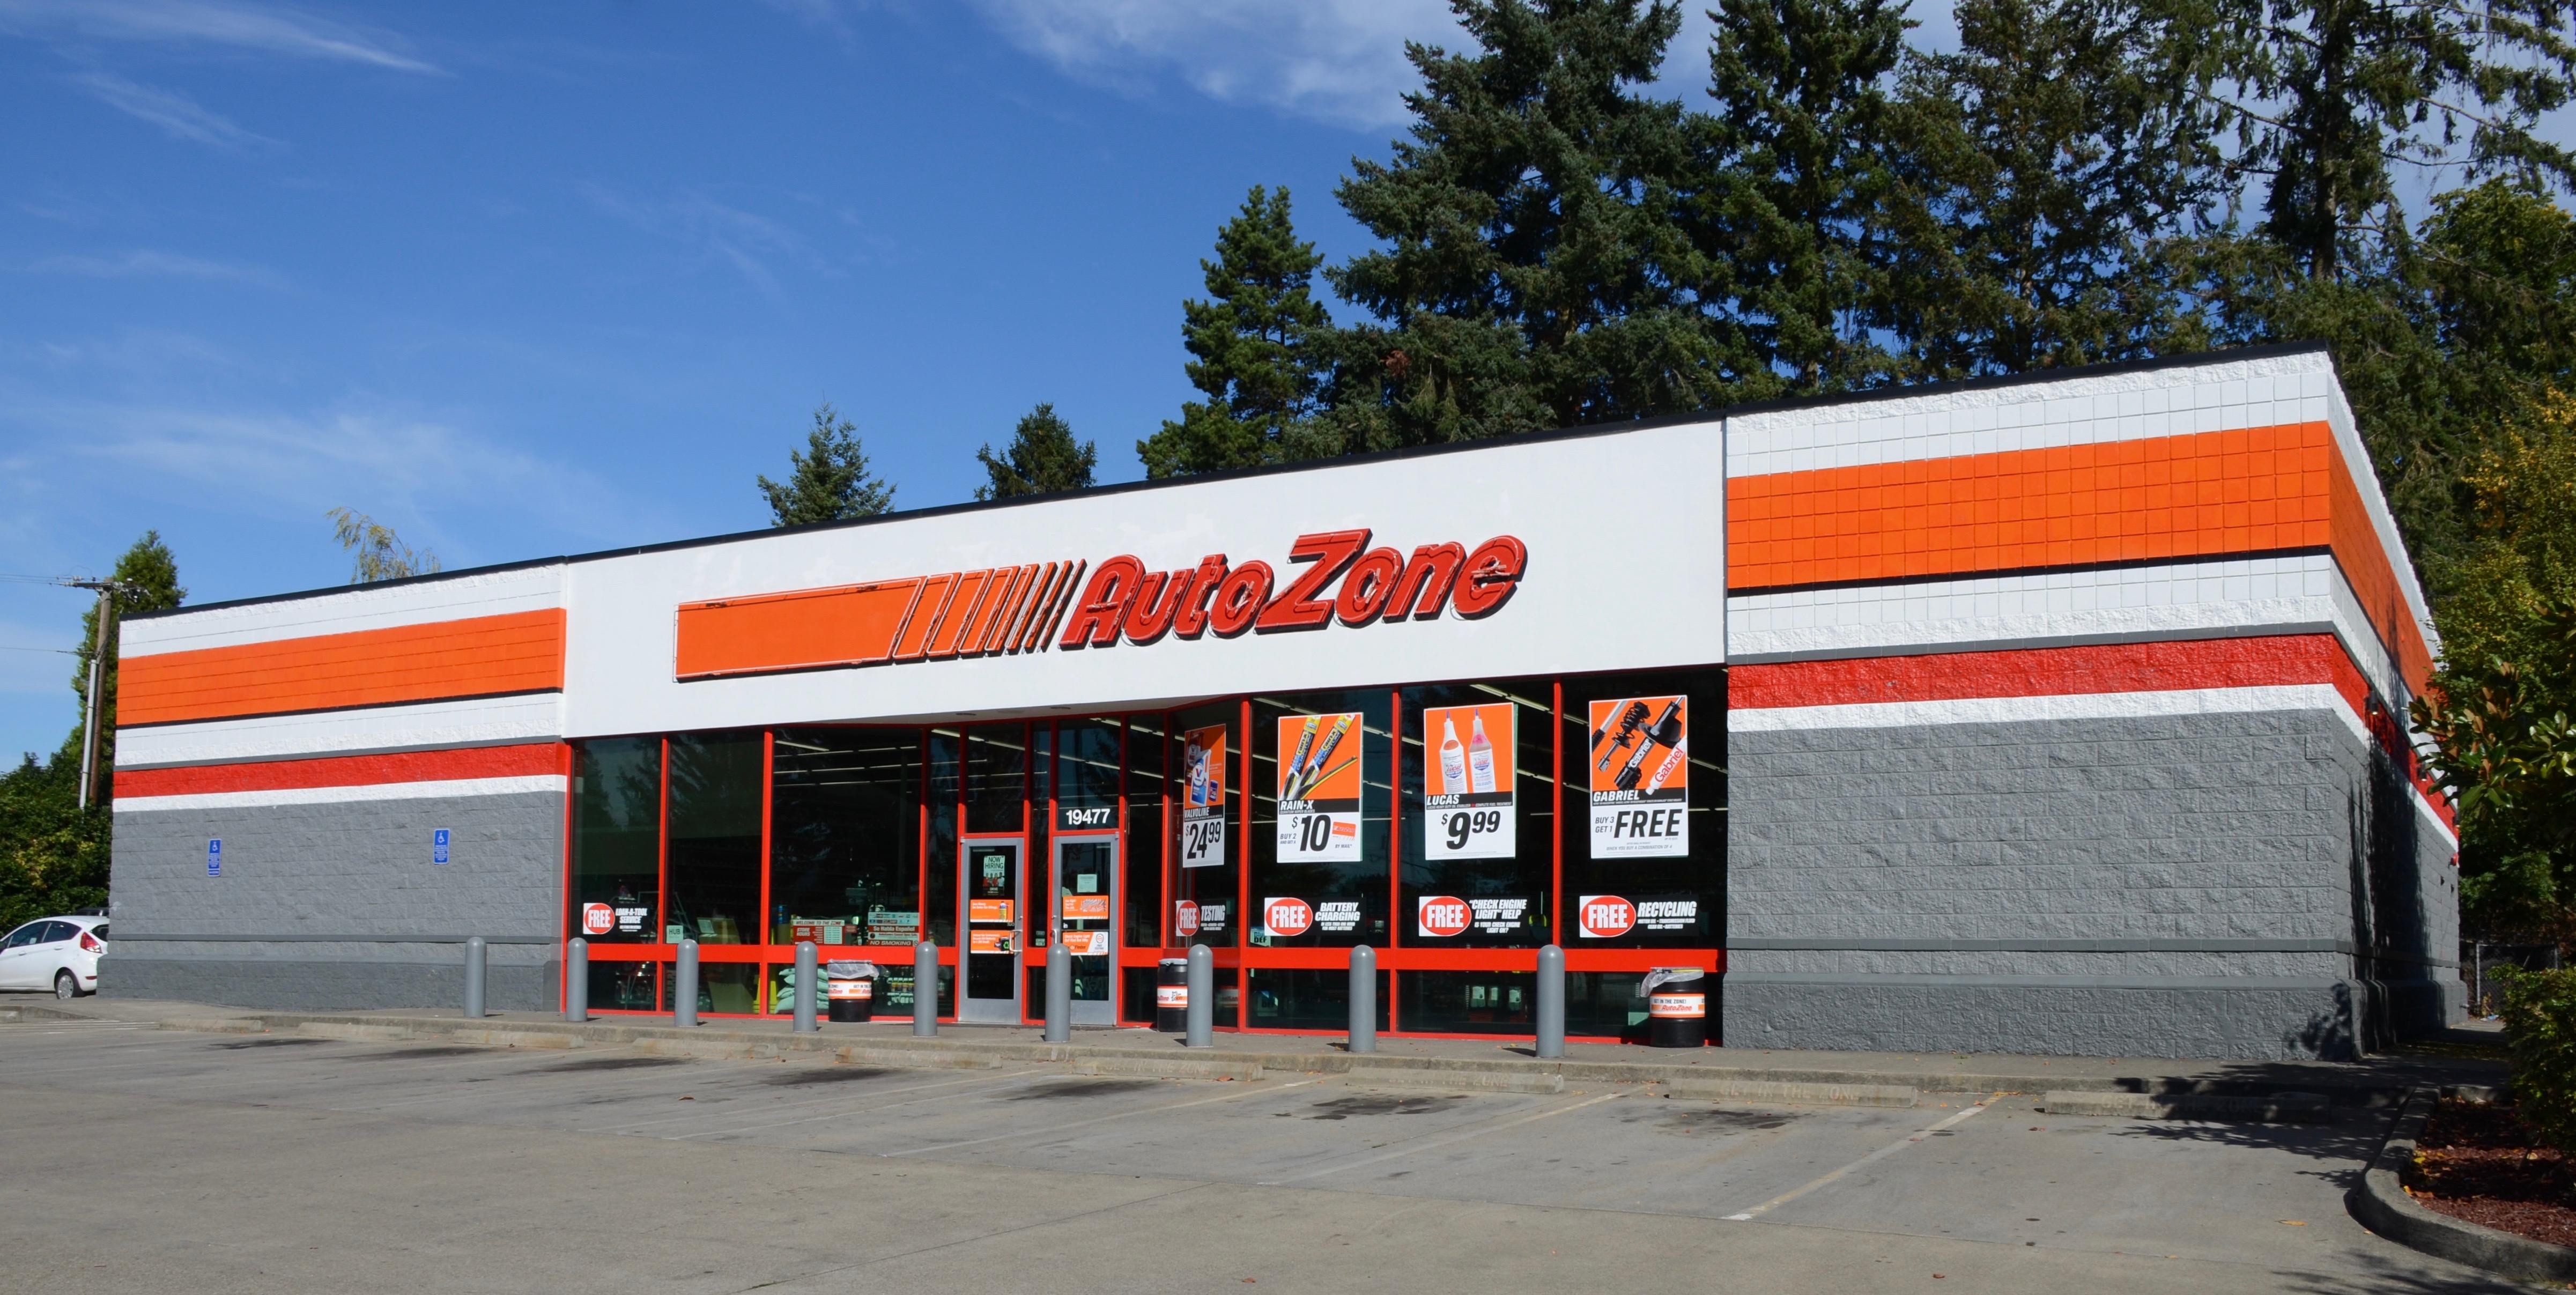 File:AutoZone store in Aloha, Oregon (2017).jpg - Wikimedia Commons